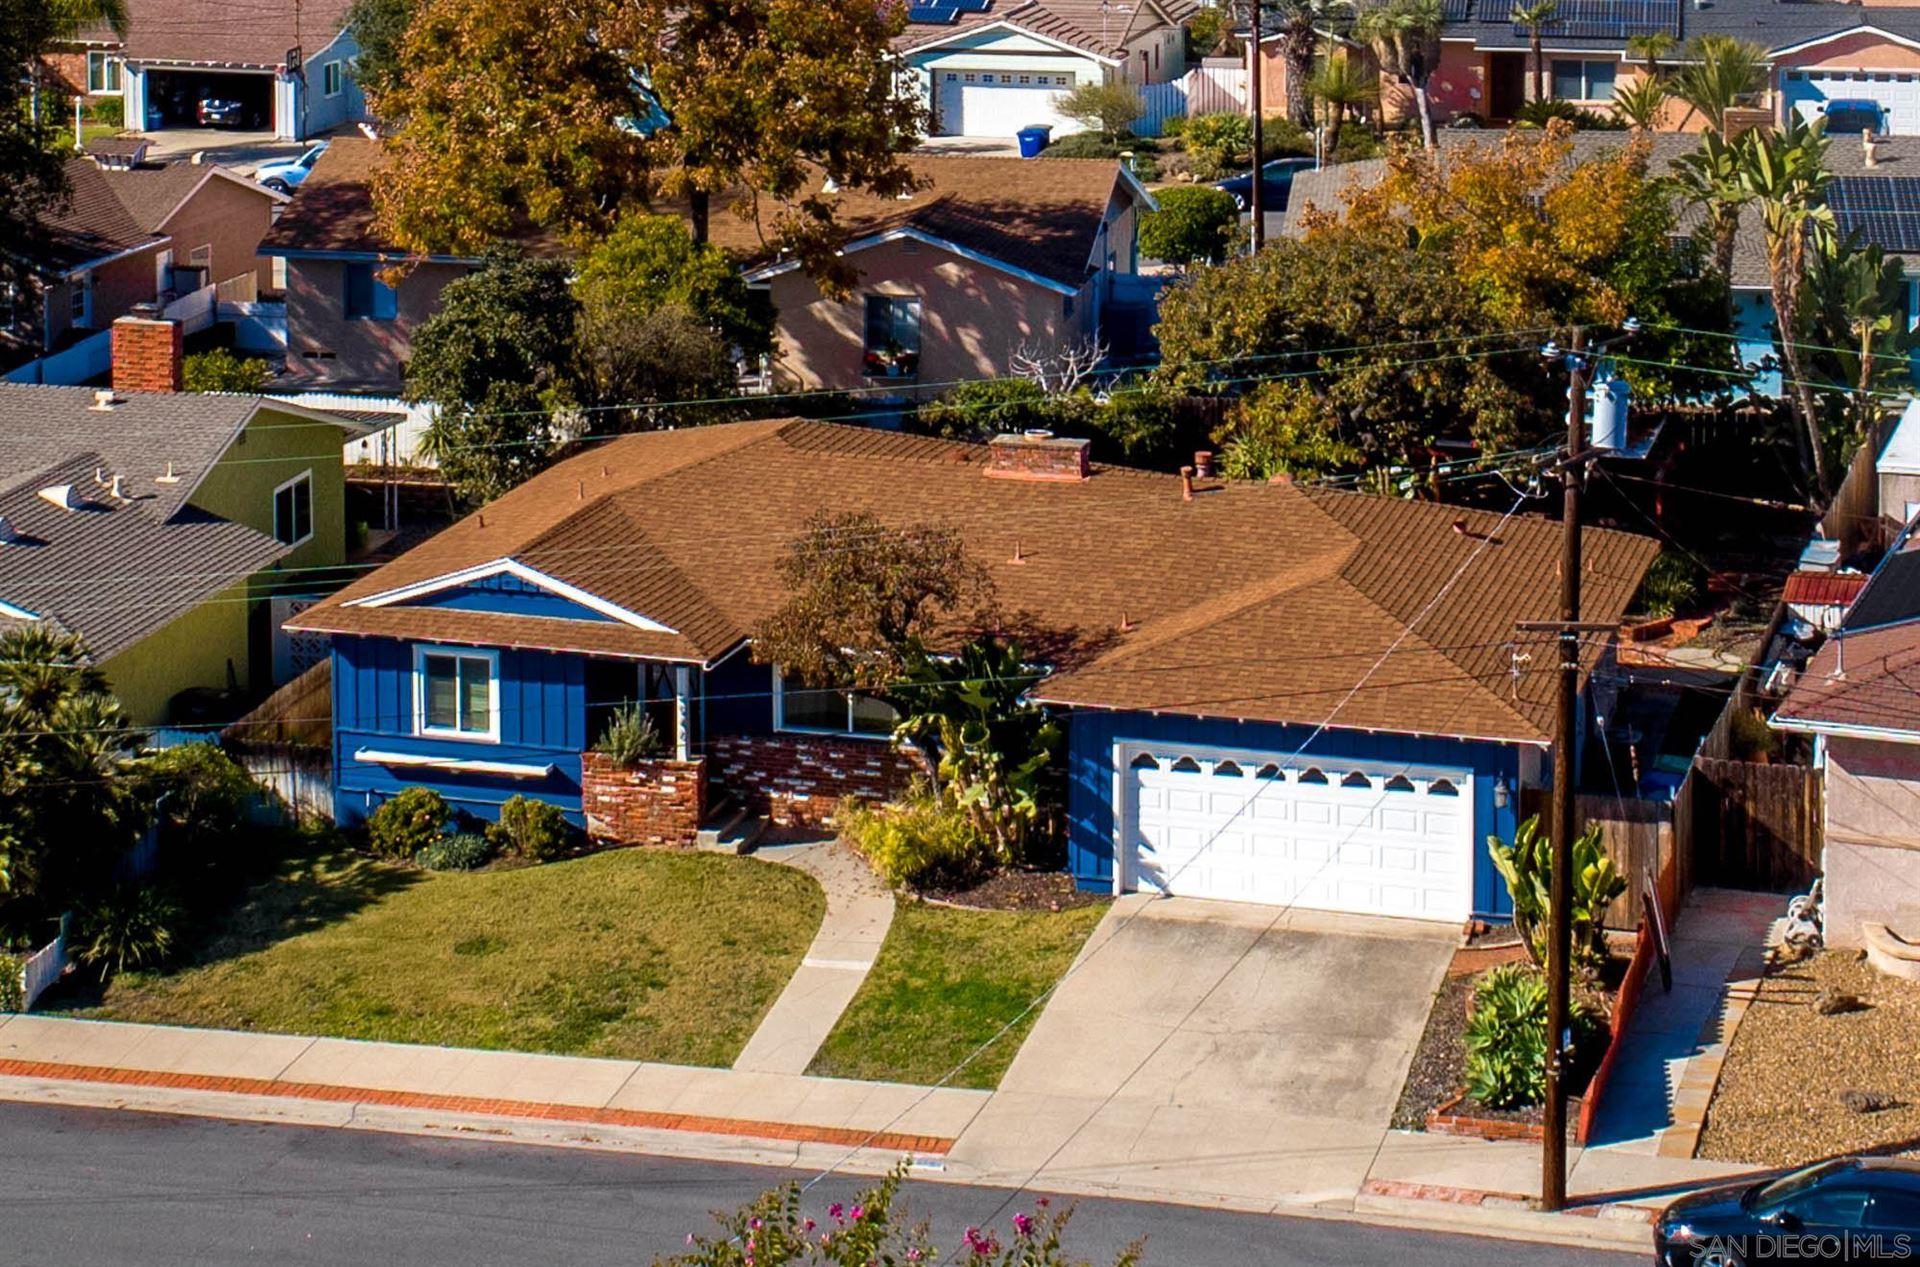 Photo of 1946 Willis Rd, El Cajon, CA 92020 (MLS # 210001102)